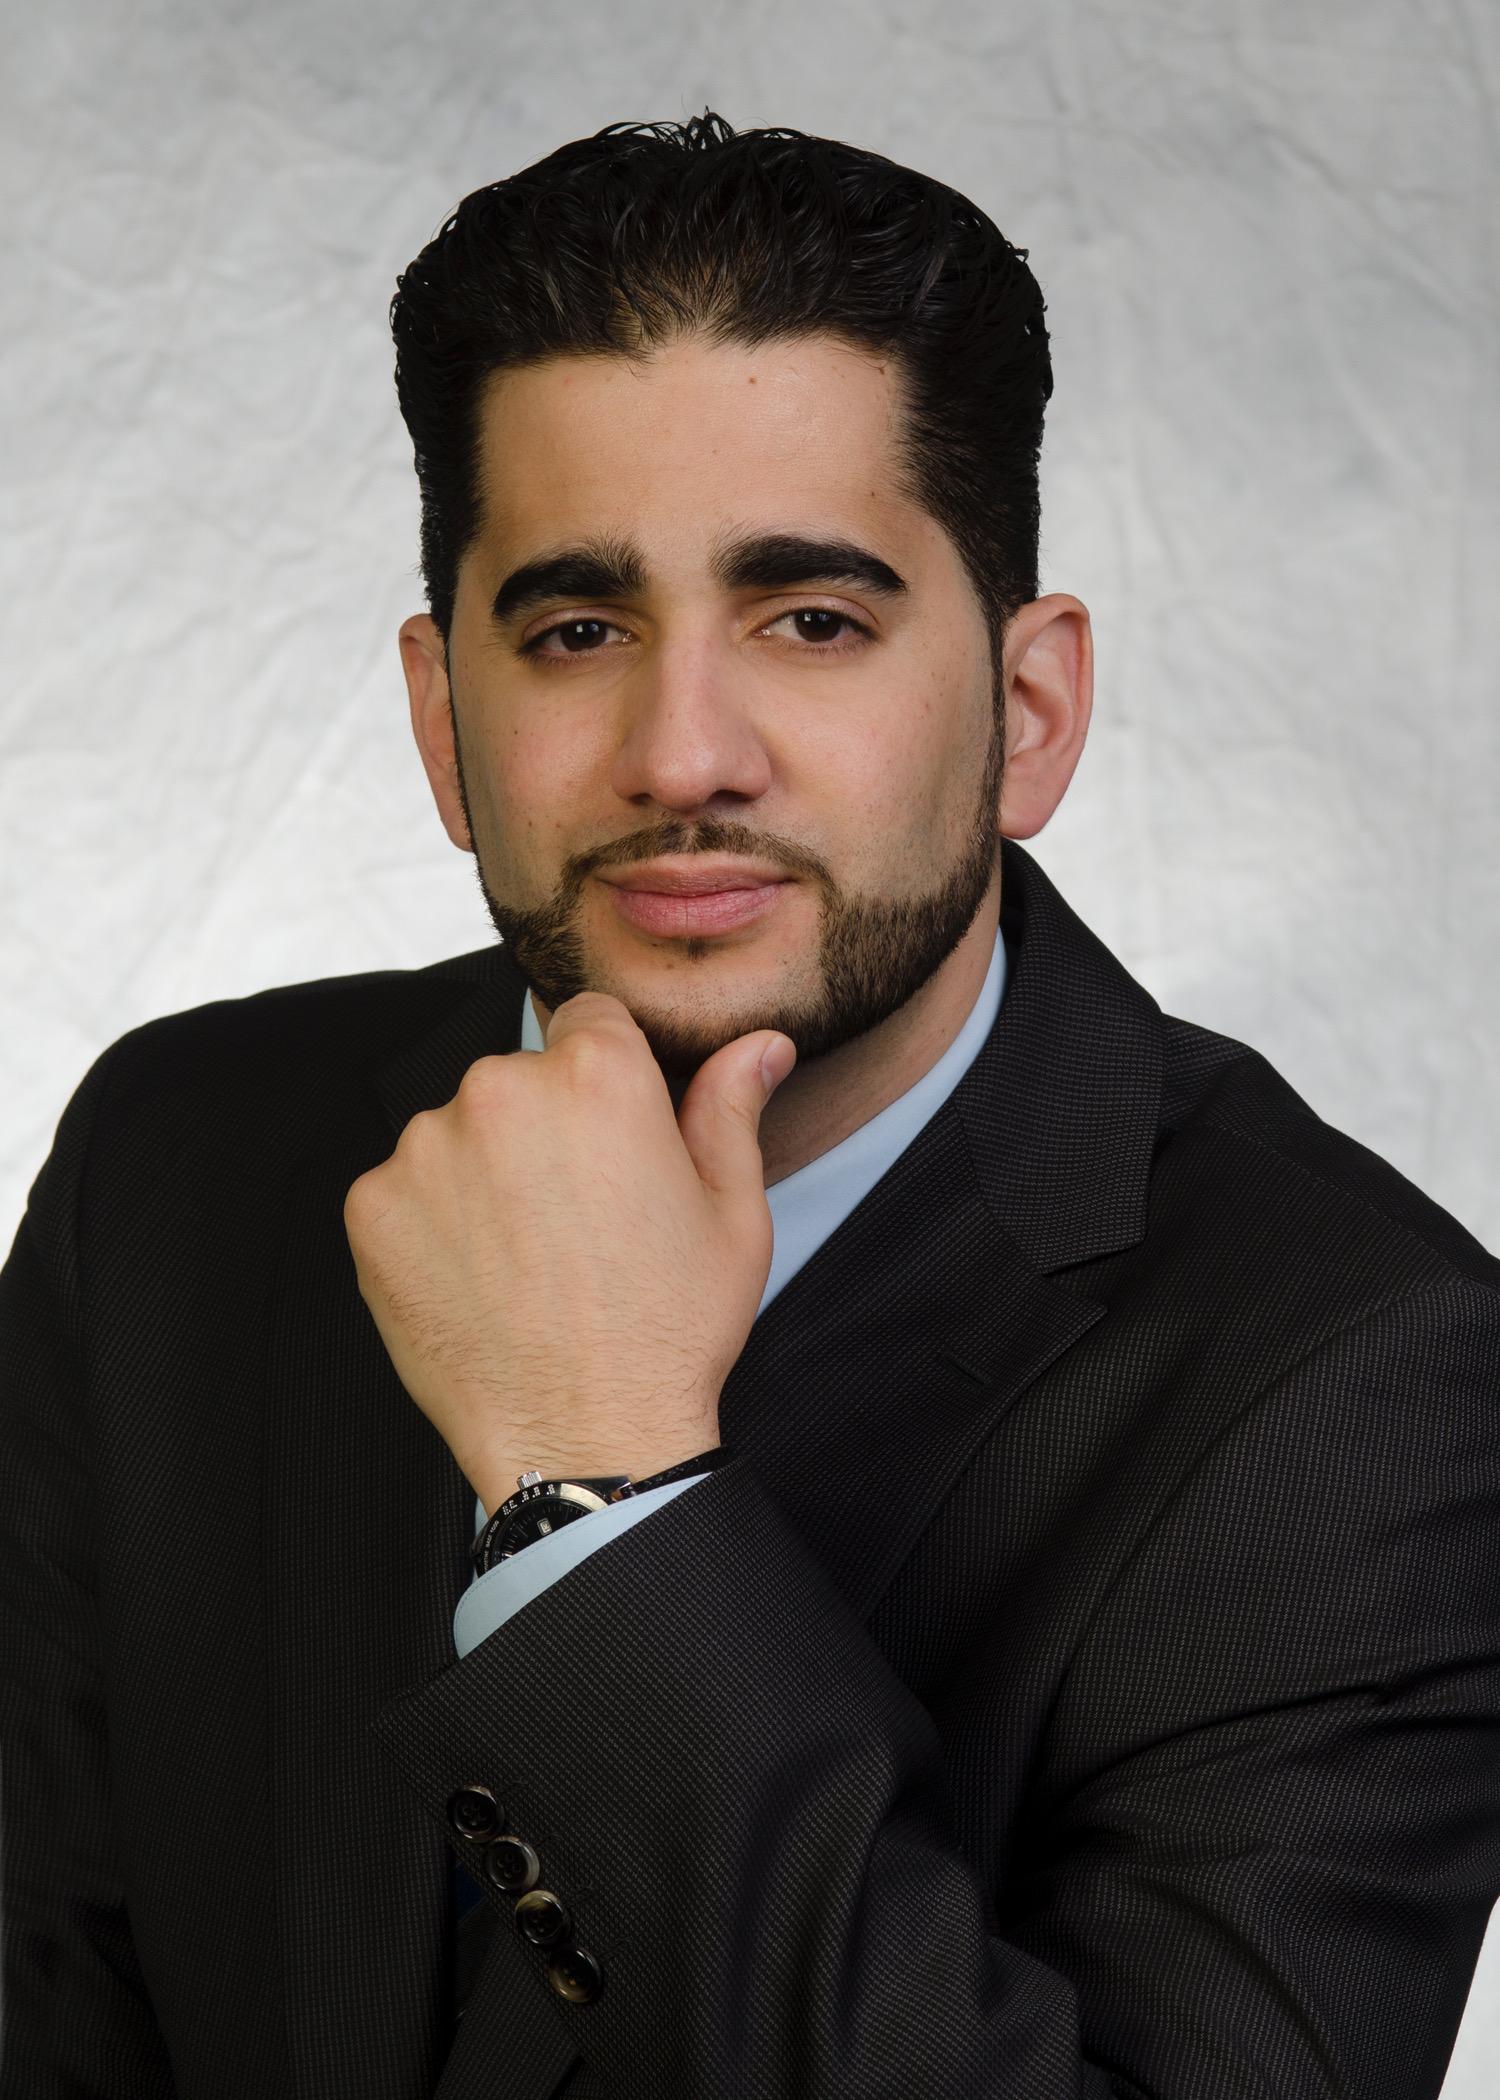 Maher Matar